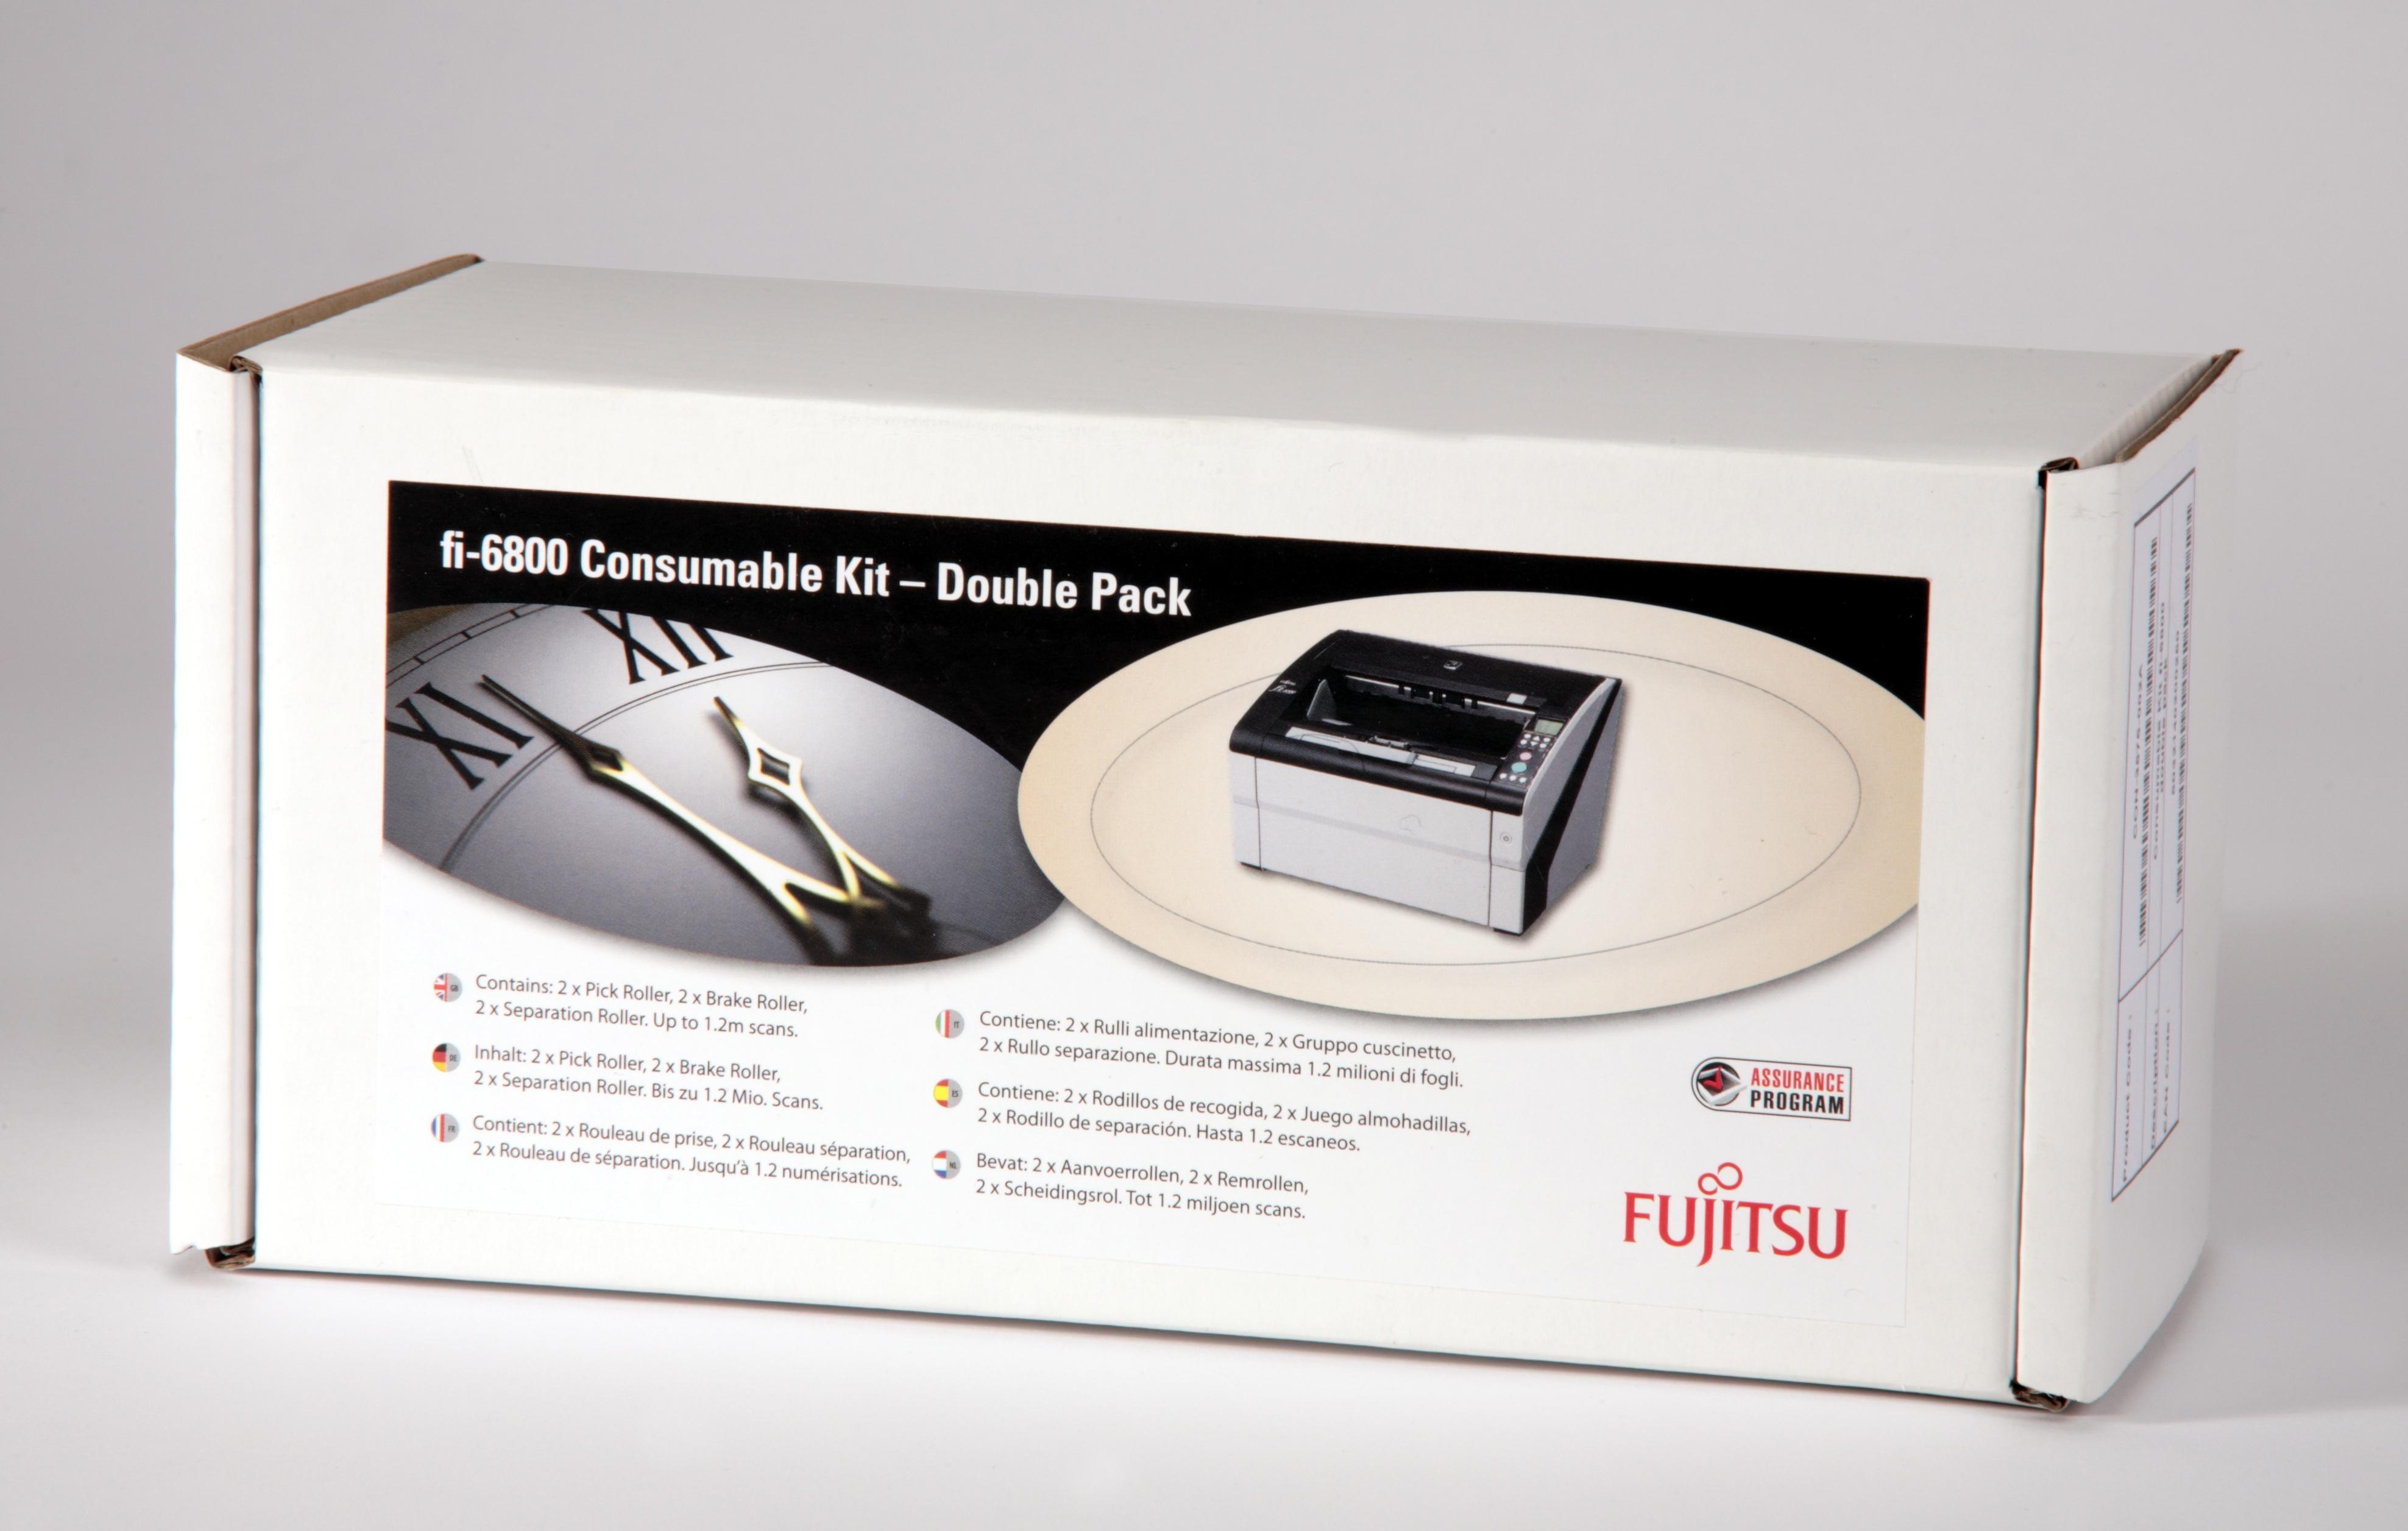 Vorschau: Fujitsu Consumable Kit